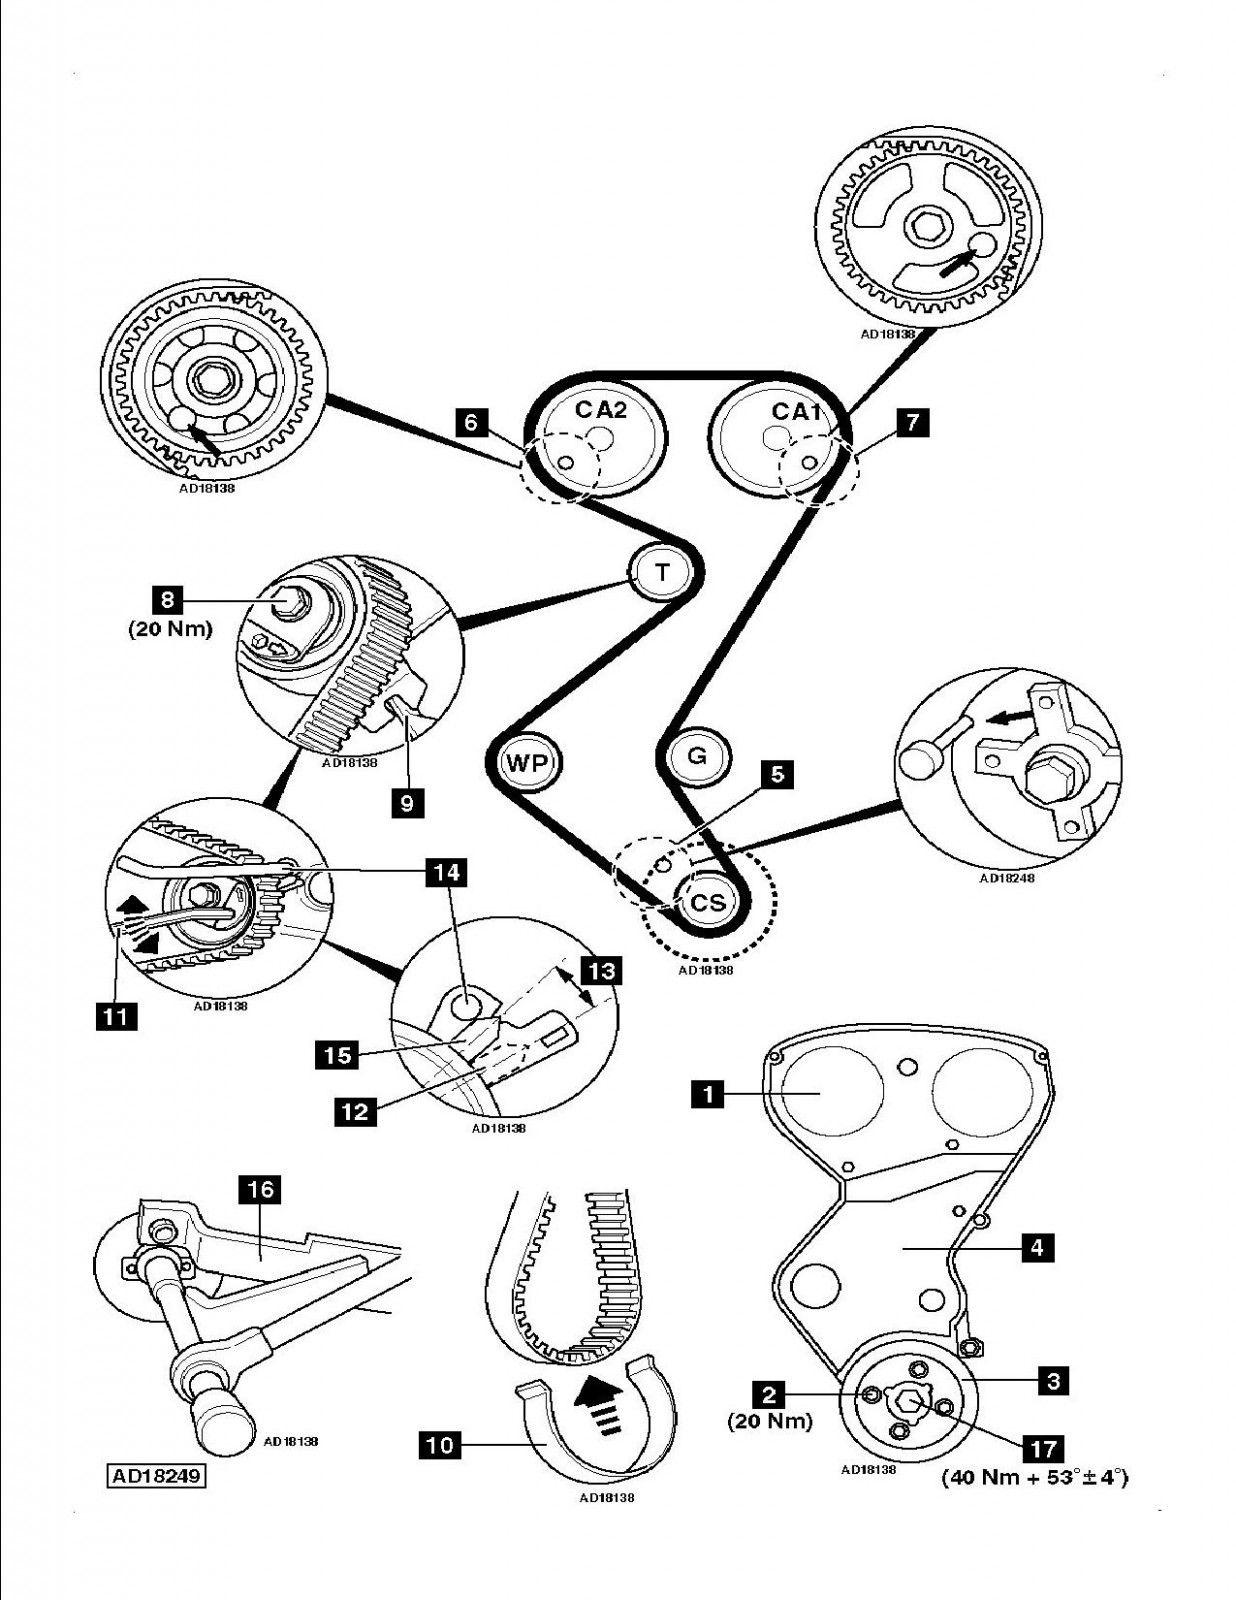 Peugeot 8 Engine Diagram Not Working Peugeot 8 Engine